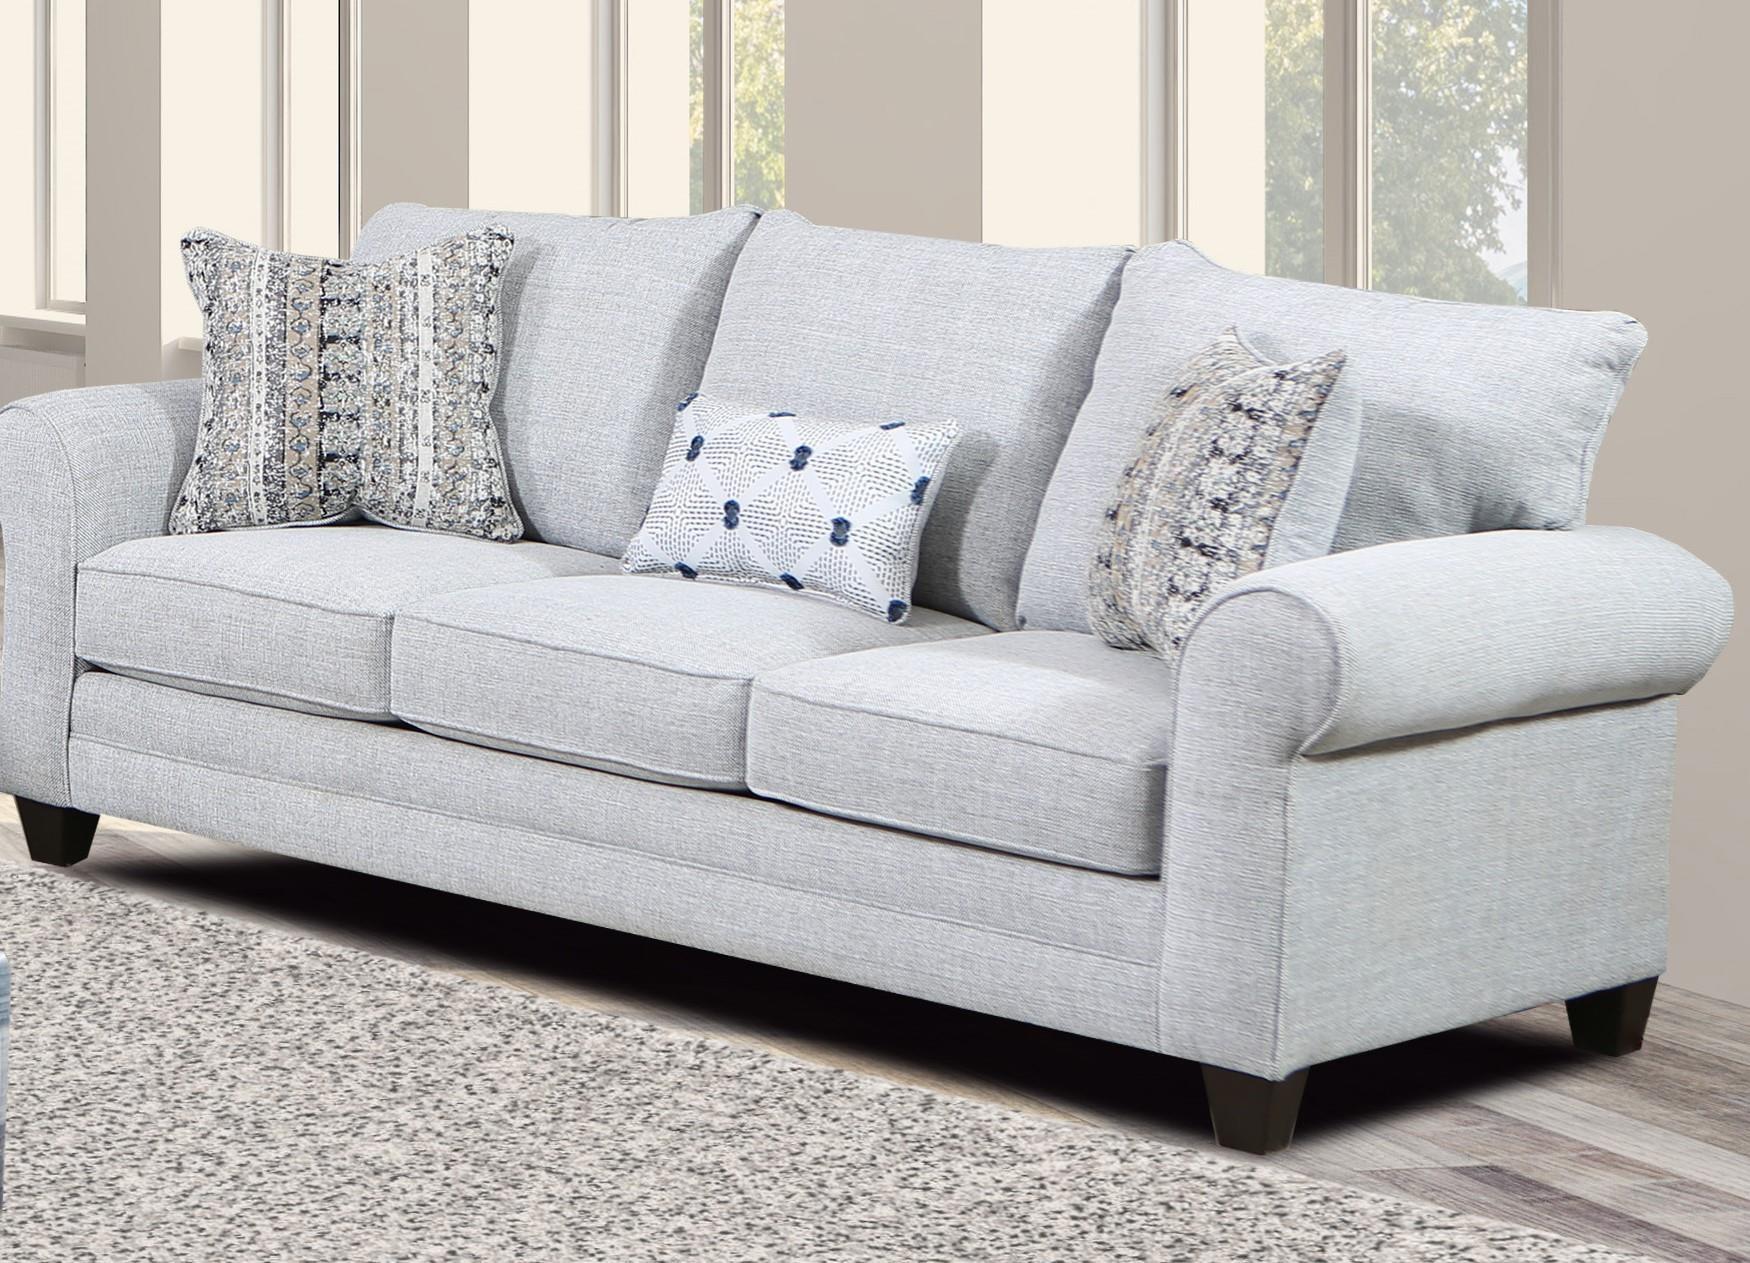 4200 QUEEN SOFA SLEEPER by Magnolia Upholstery Design at Furniture Fair - North Carolina